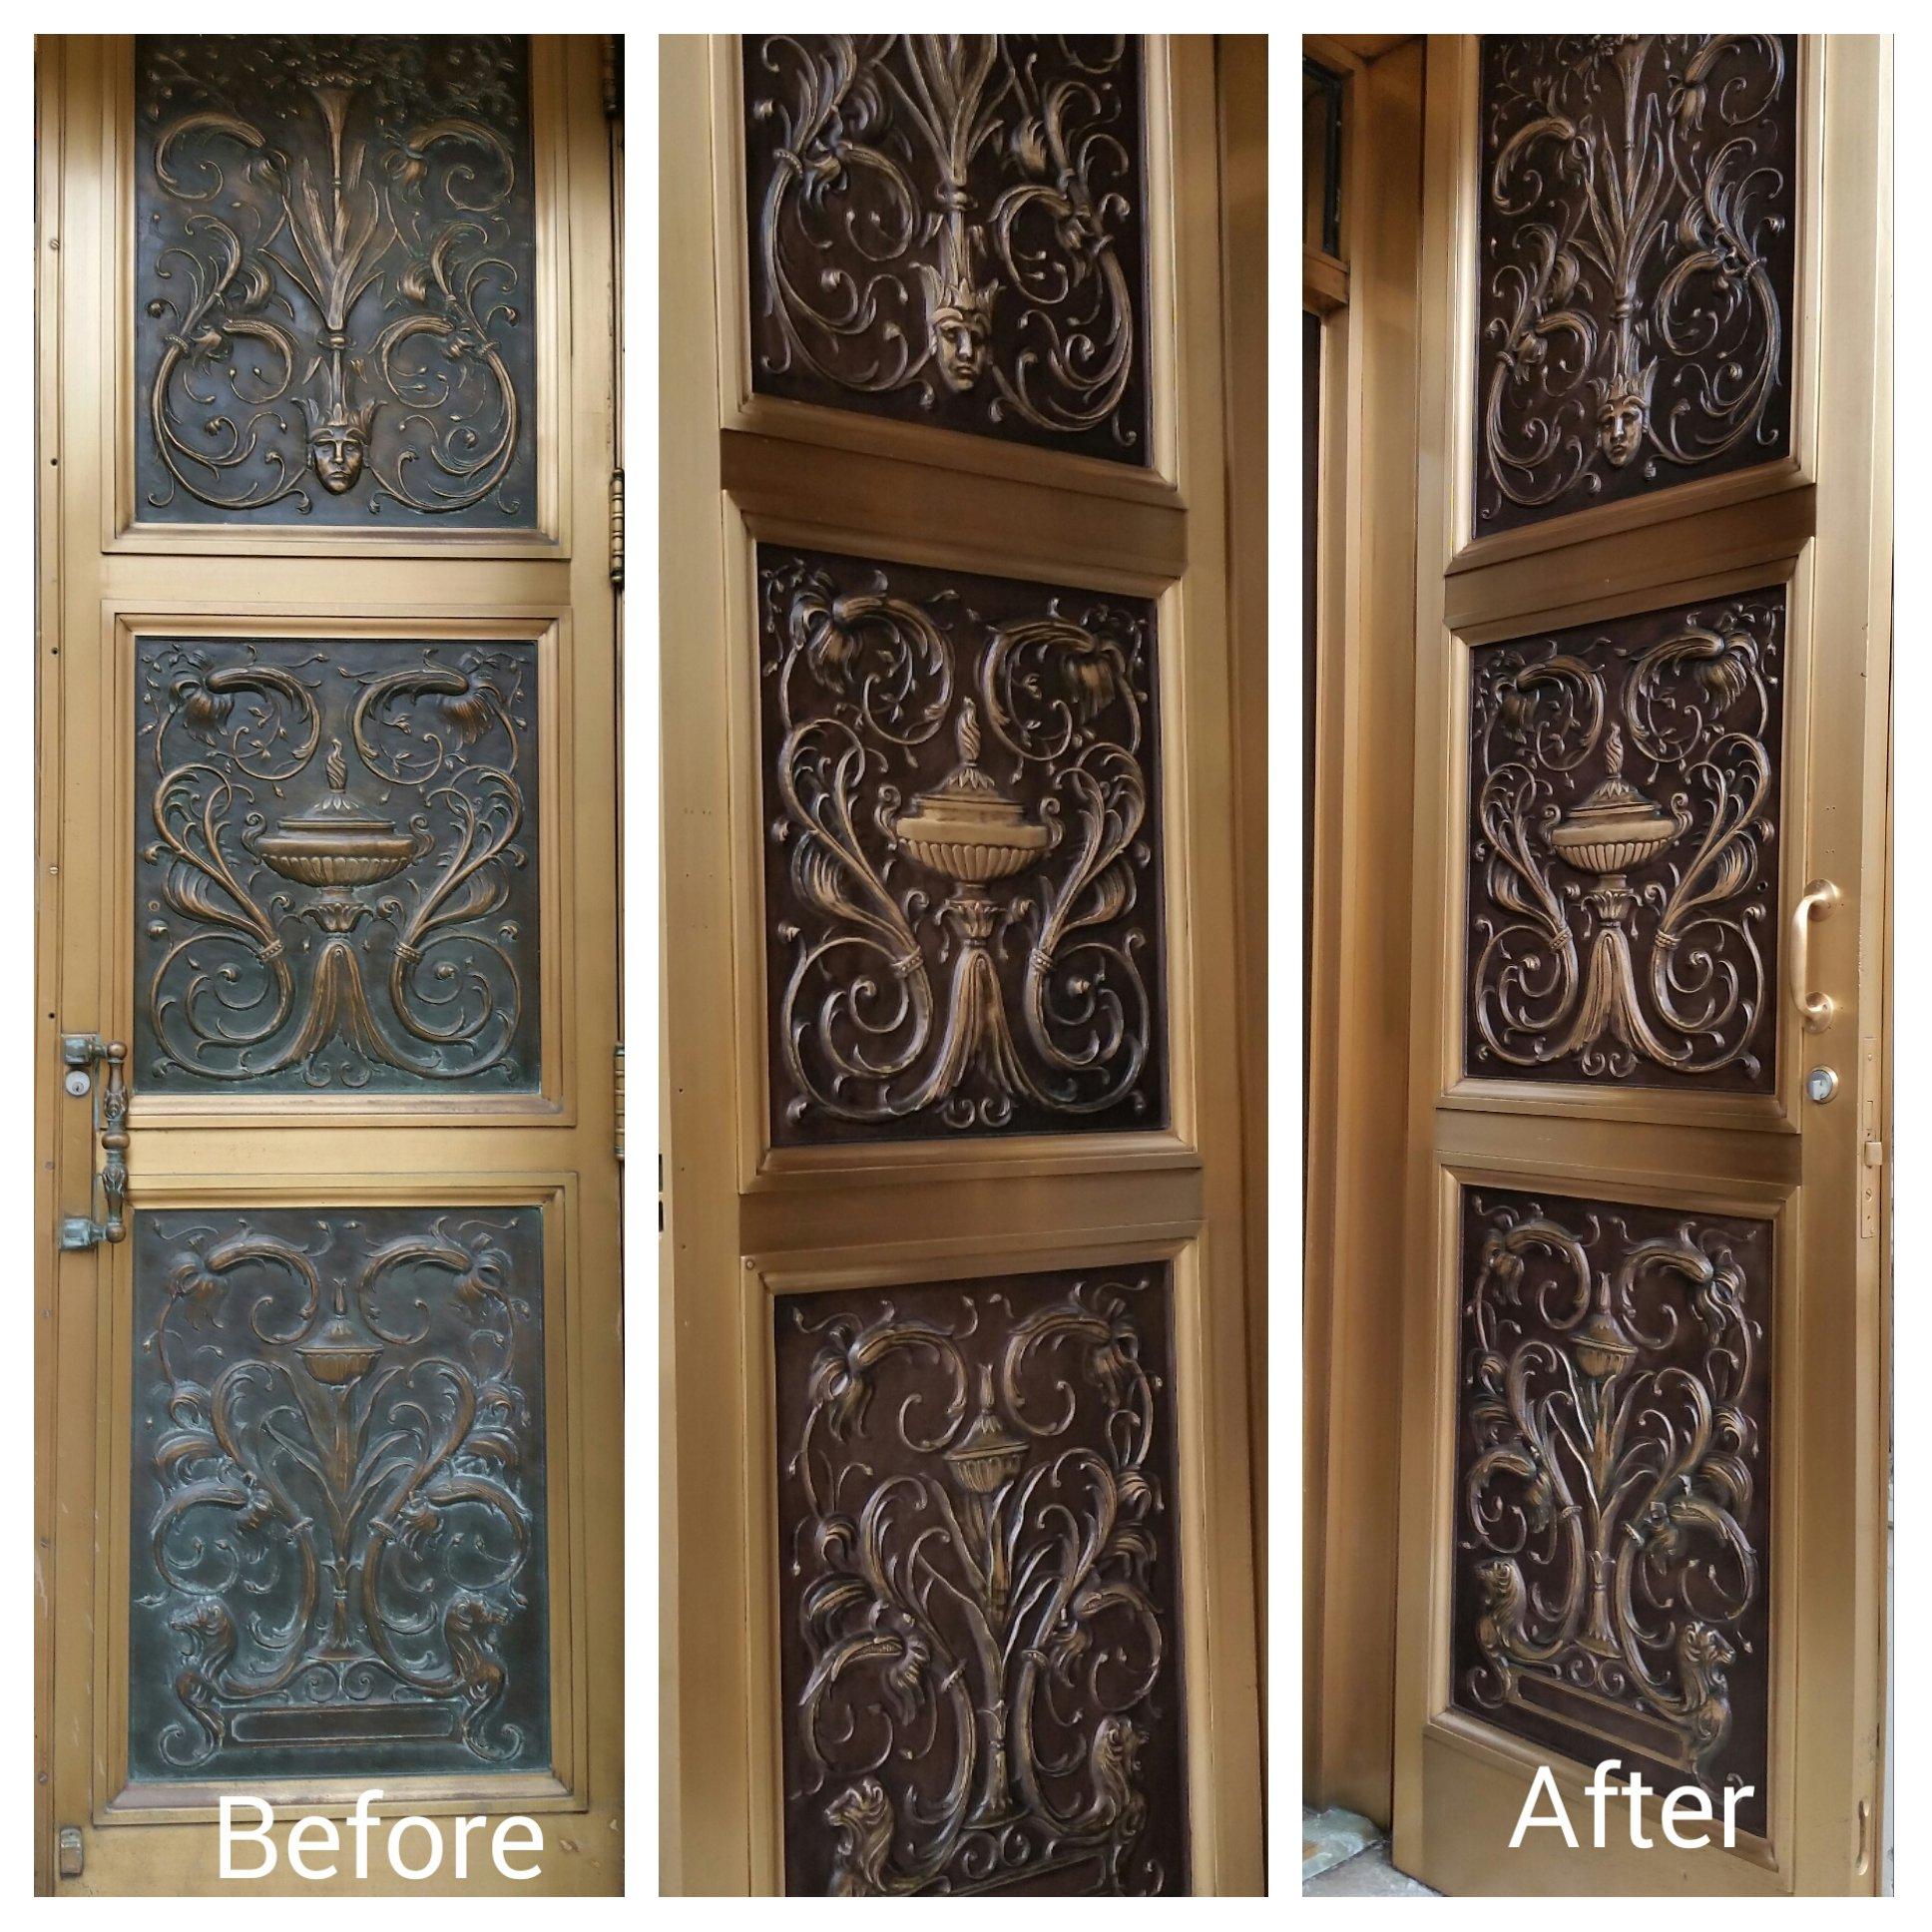 Decorative Door Panels : Ornate decorative doors in the deramus building